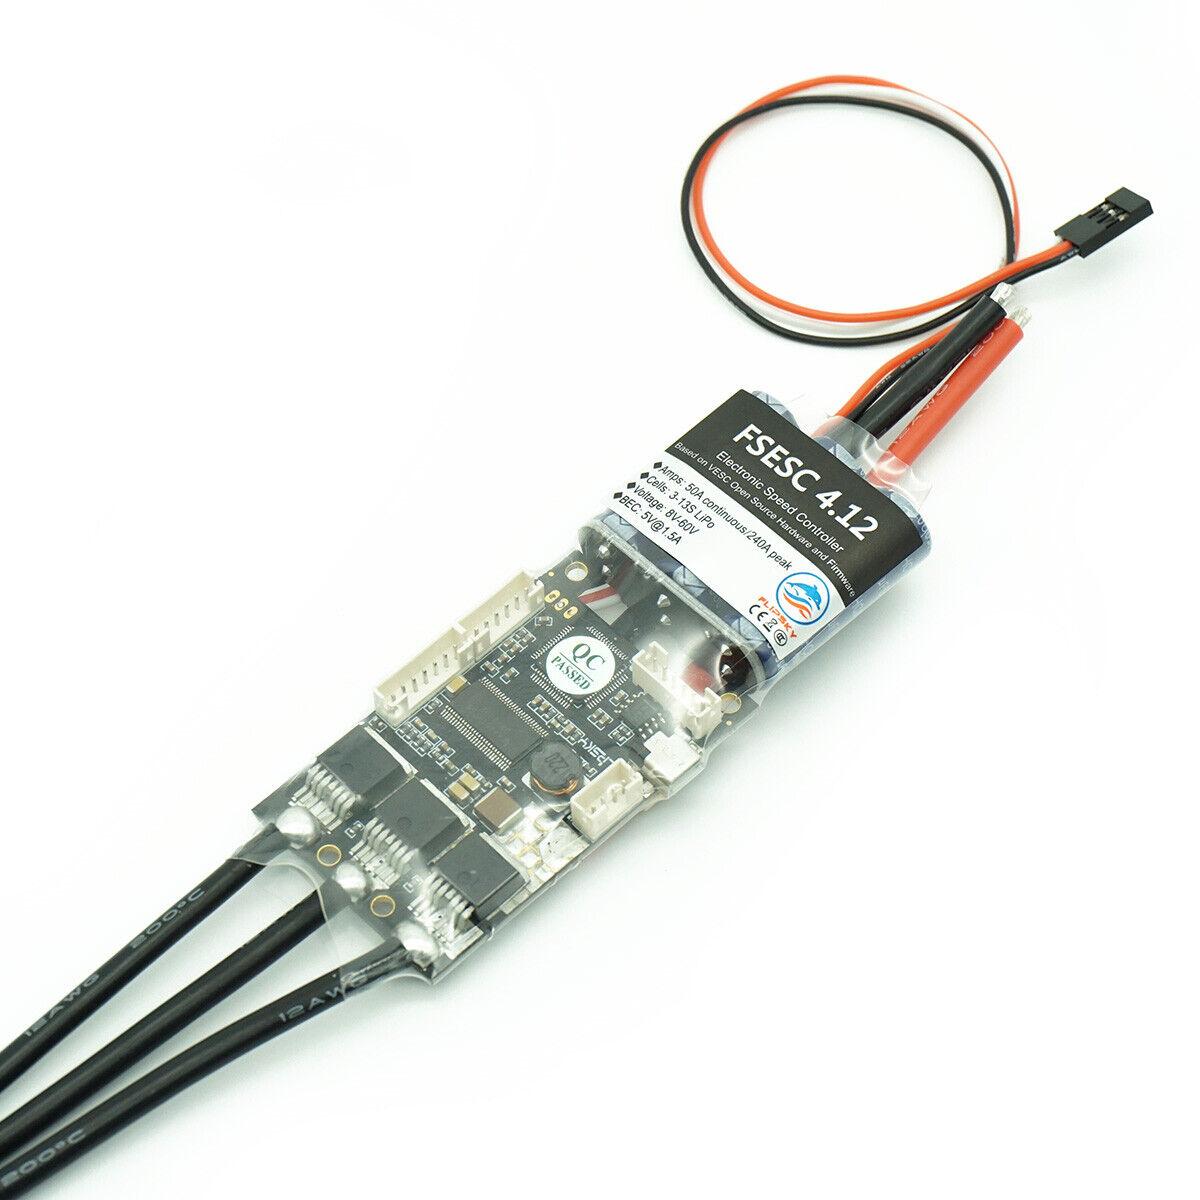 Standrad  Flipsky FSESC 4.12  VESC4 Controller for electric longboard standrad  considerate service